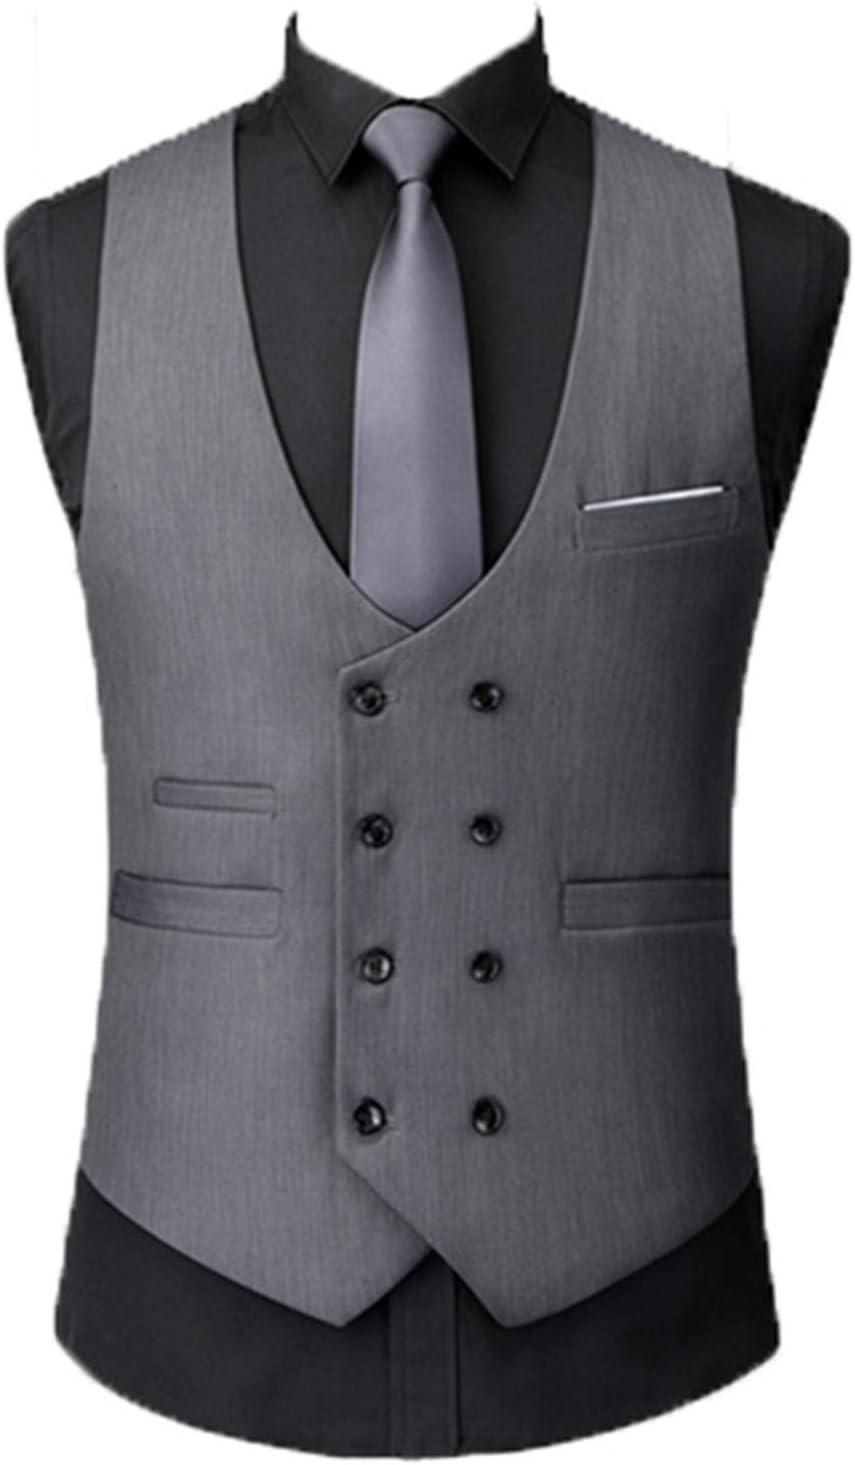 Men's Waistcoat Challenge the lowest price of Japan Vintage Business Suit Weddi Slim Manufacturer direct delivery Vest Fit Gilet